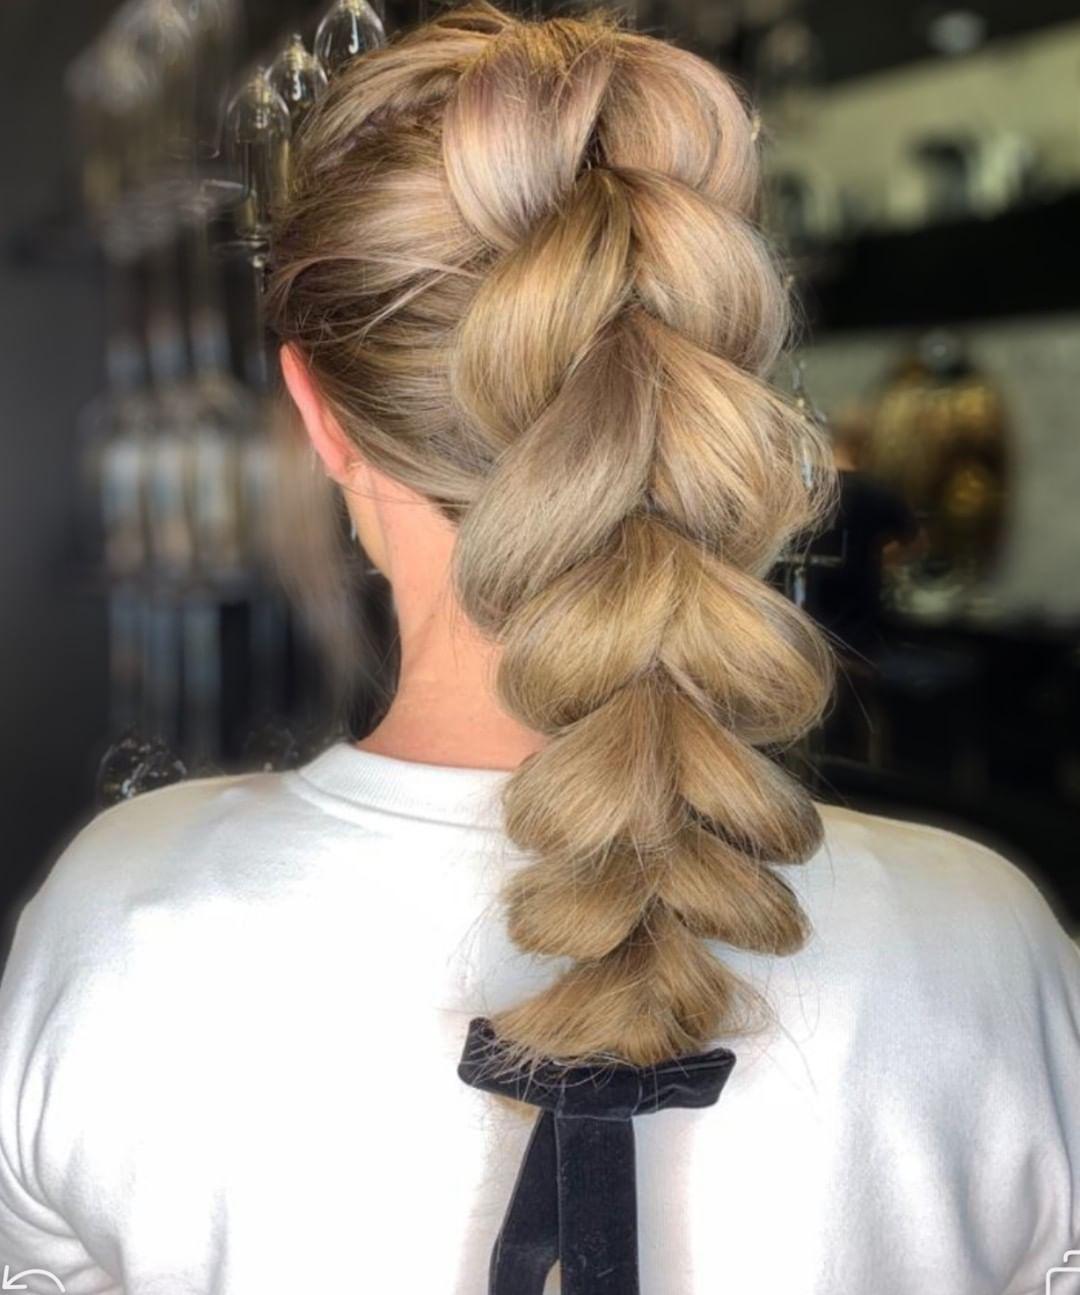 Pin On Pierre Haddad Hair Styling